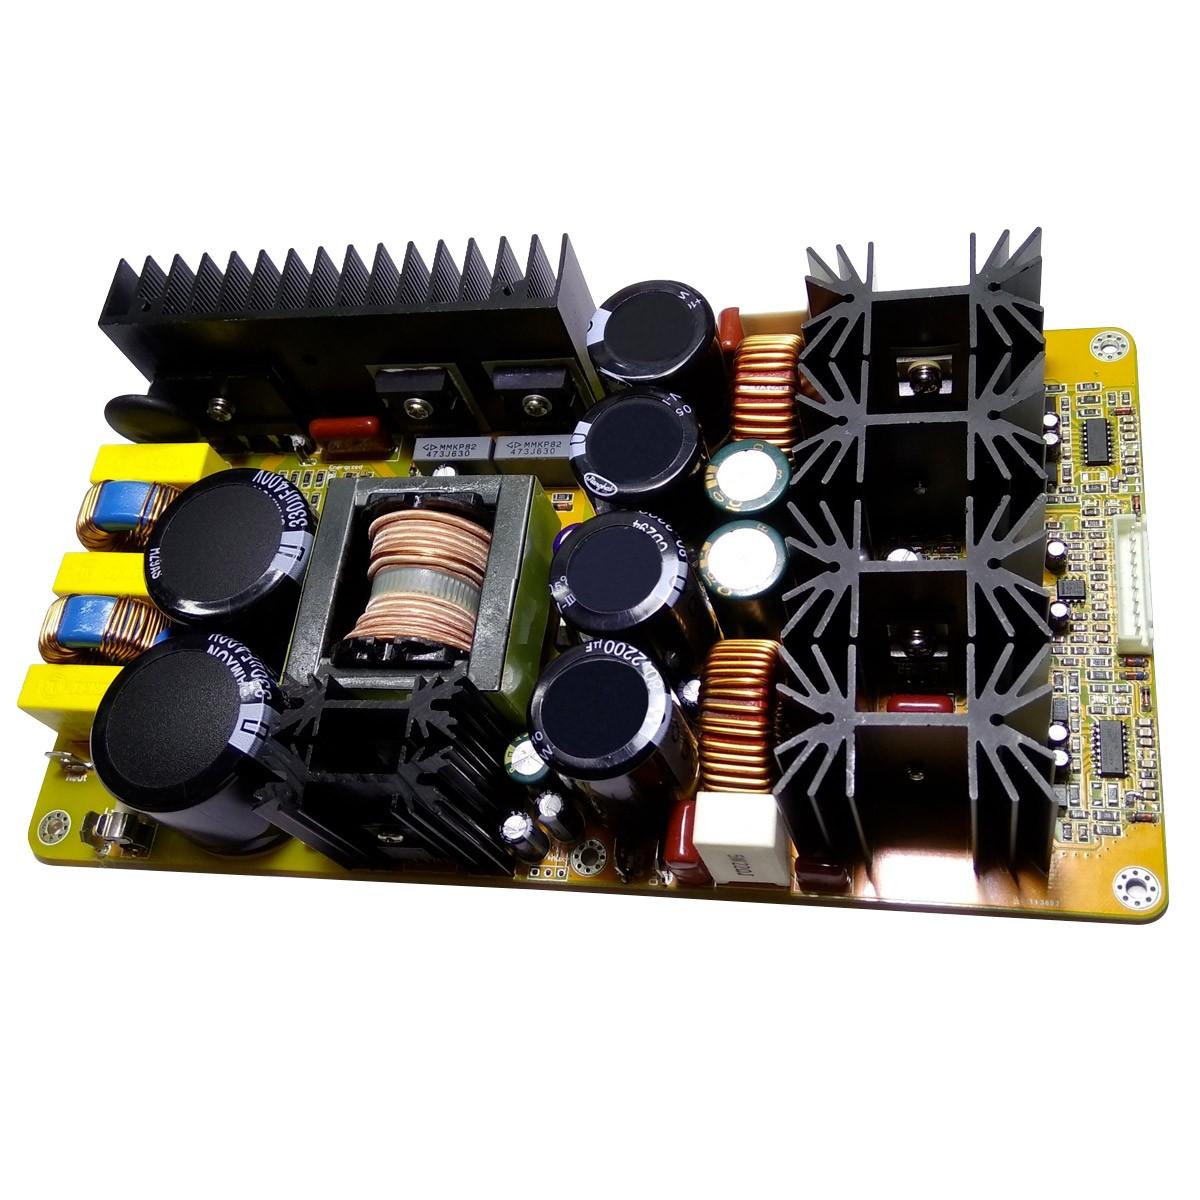 CONNEX IRS2400SMPS Class D Amplifier Module IRS2092S 2x 400W 4Ω